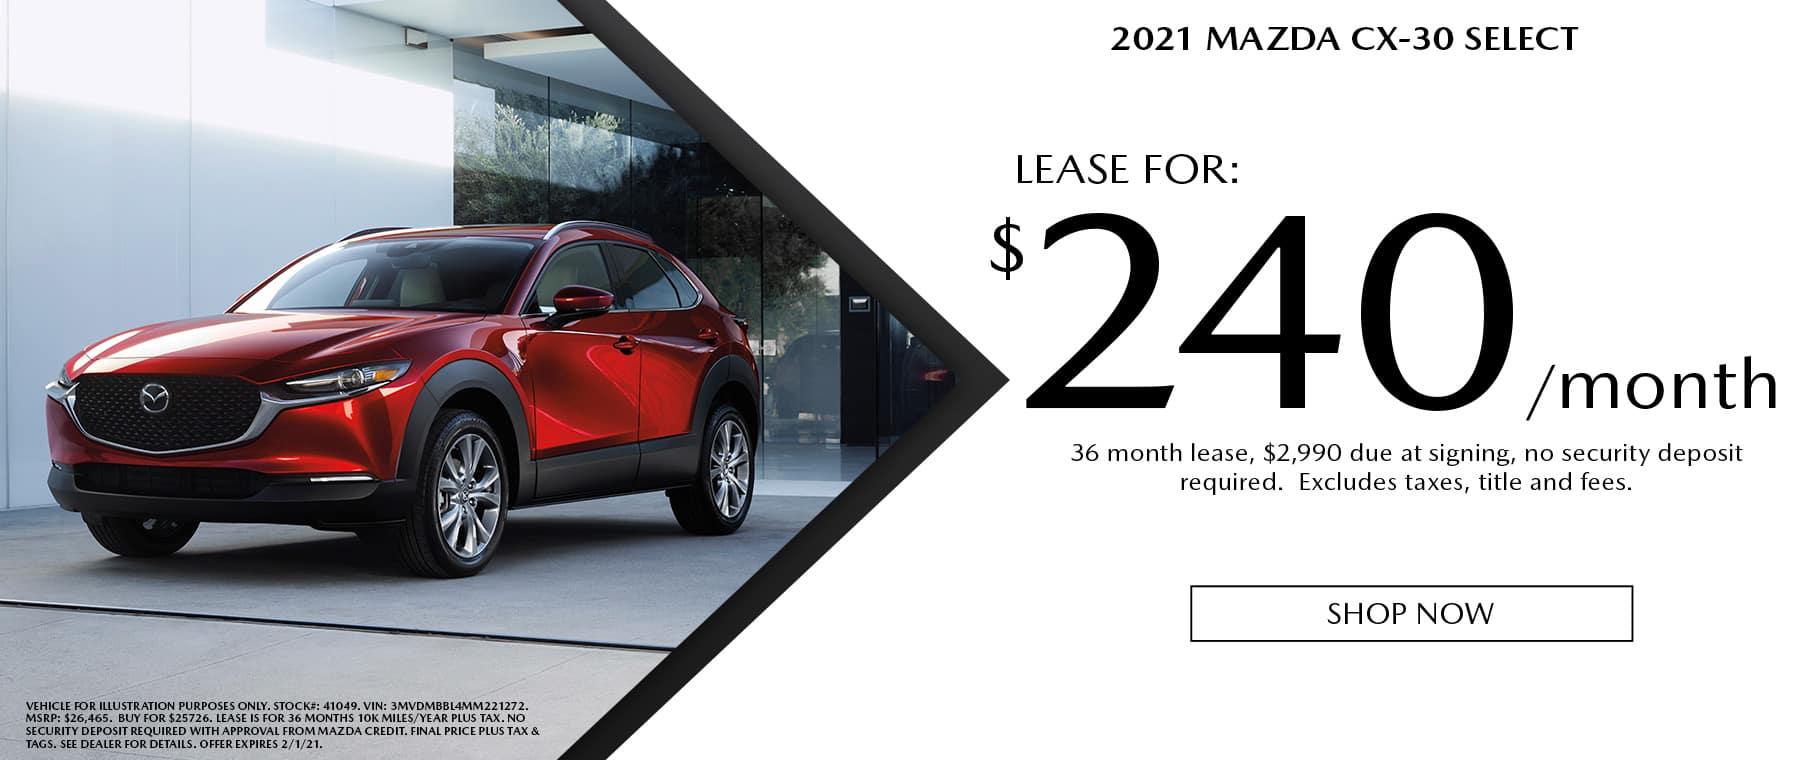 1_21_WV_Mazda_Web_Banners-2021-CX30